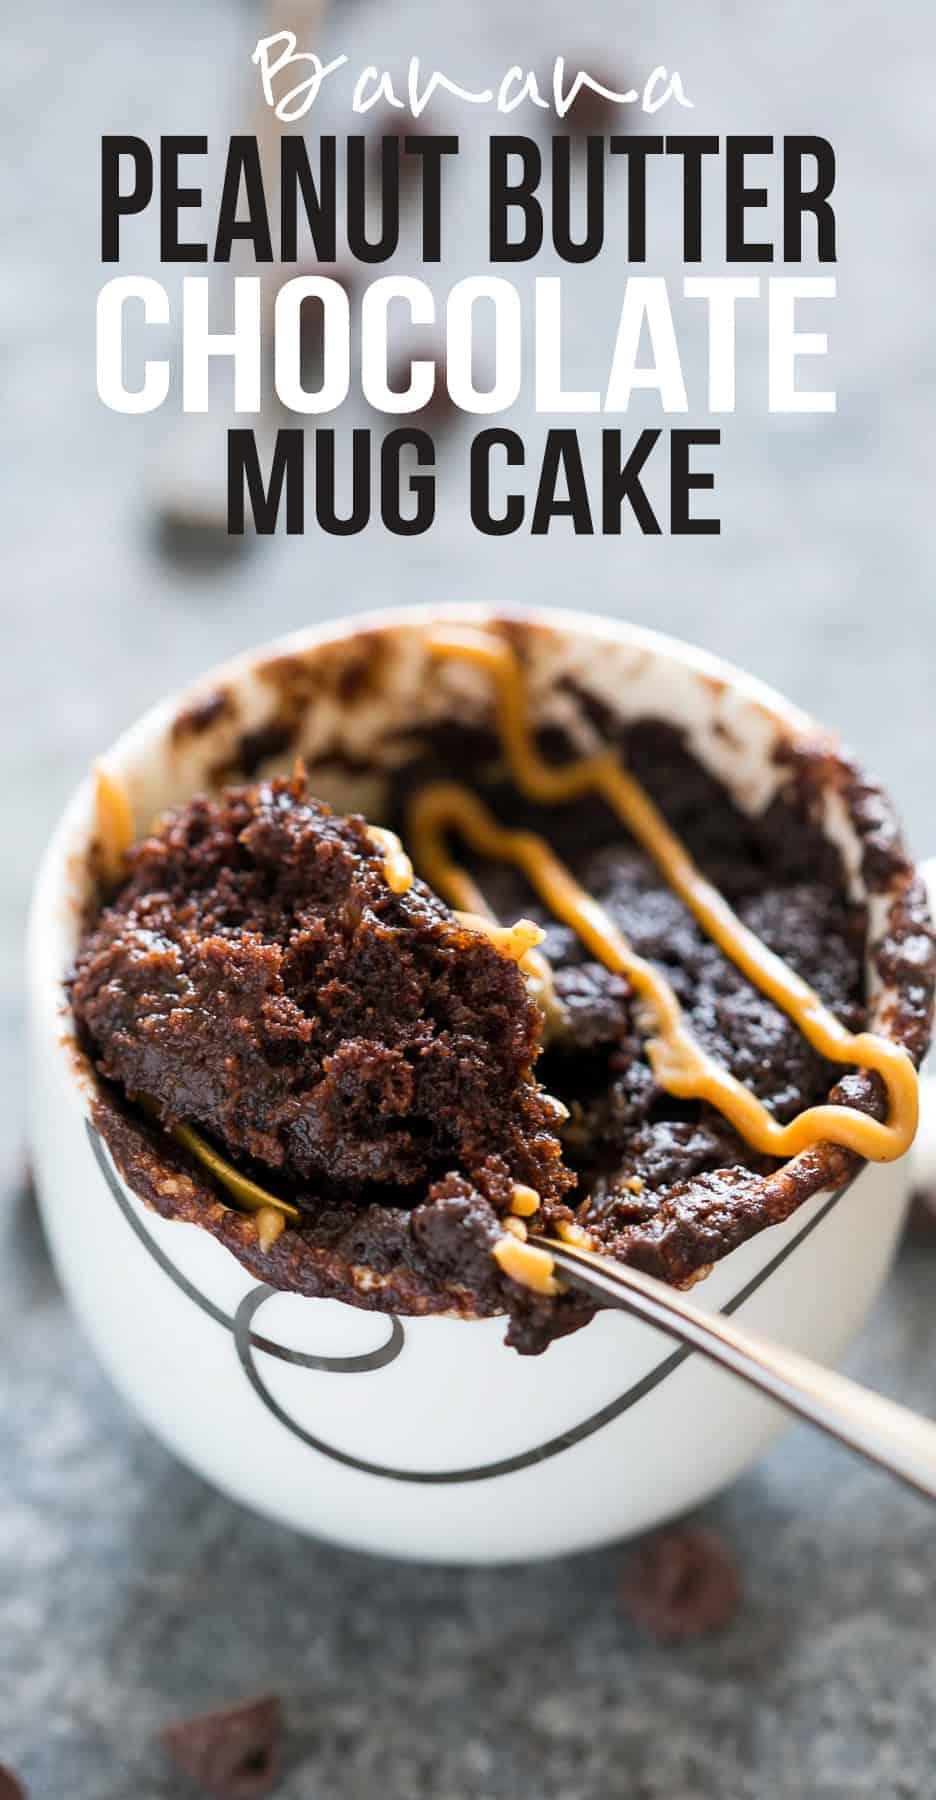 Banana Chocolate Peanut Butter Mug Cake | Microwave Mug Cake Recipe | Eggless Mug Cake | Molten Gooey Egg Free Chocolate Mug Cake | Vegan